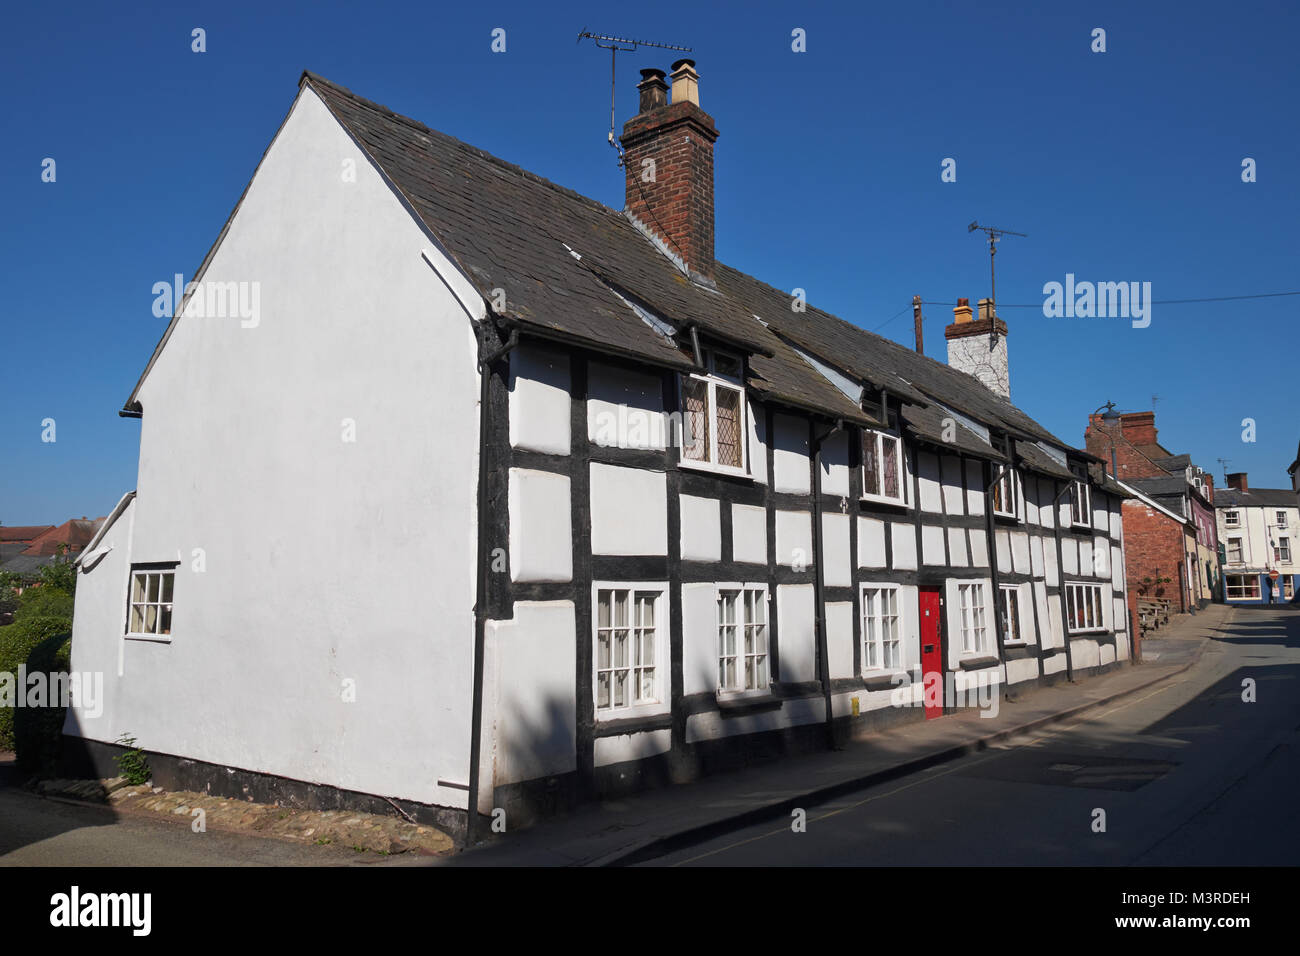 Row of half-timbered cottages at Ellesmere, Shropshire, England, UK. - Stock Image